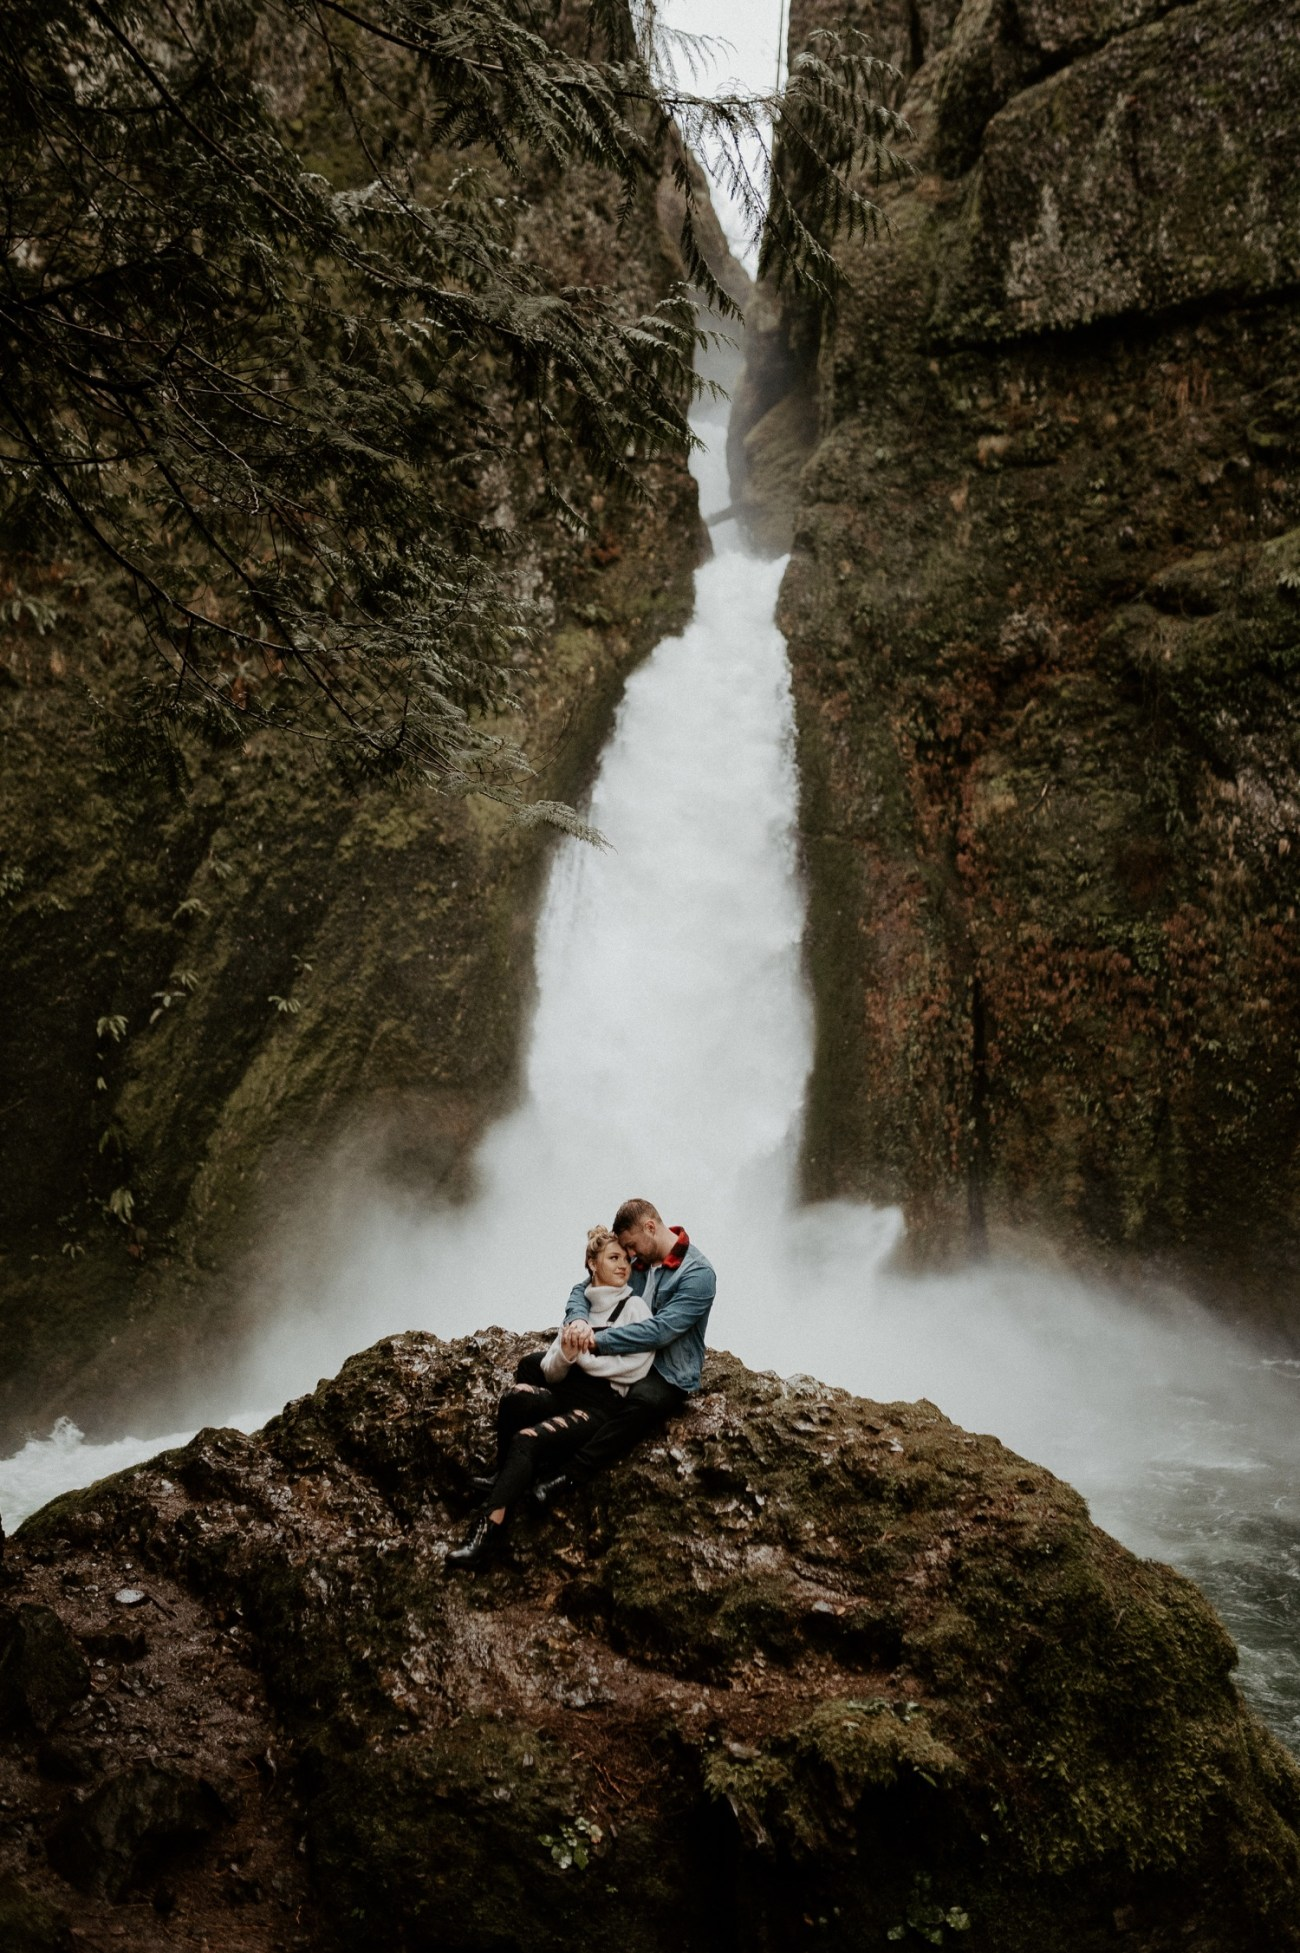 Wahclella Falls Engagement Session Columbia River Gorge Oregon Portland Wedding Photographer Anais Possamai Photography 032